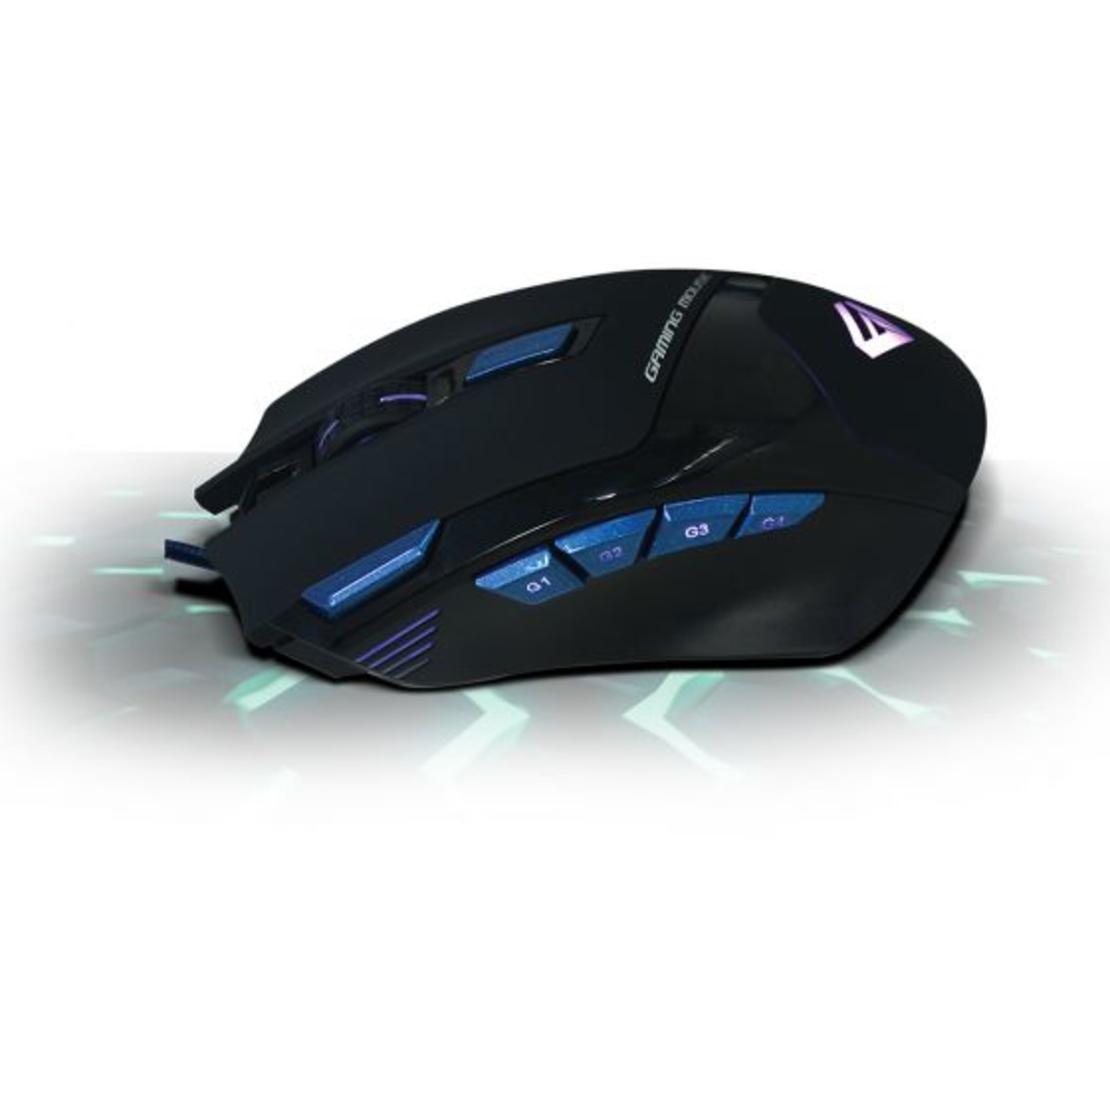 עכבר גיימינג חוטי Scorpius by SILVER LINE 4800dpi GM808